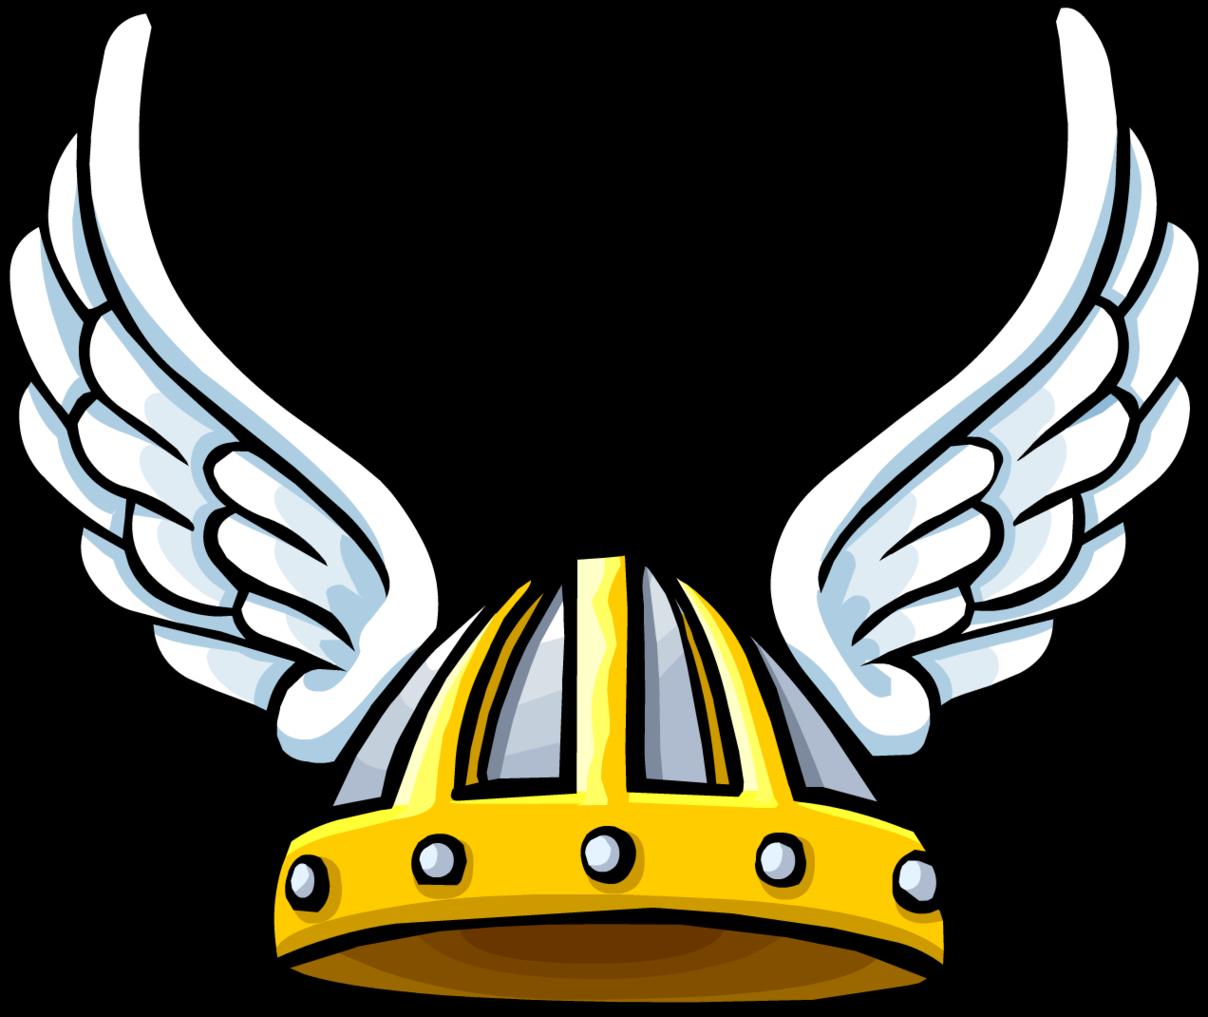 1208x1017 Hat Clipart Vikings